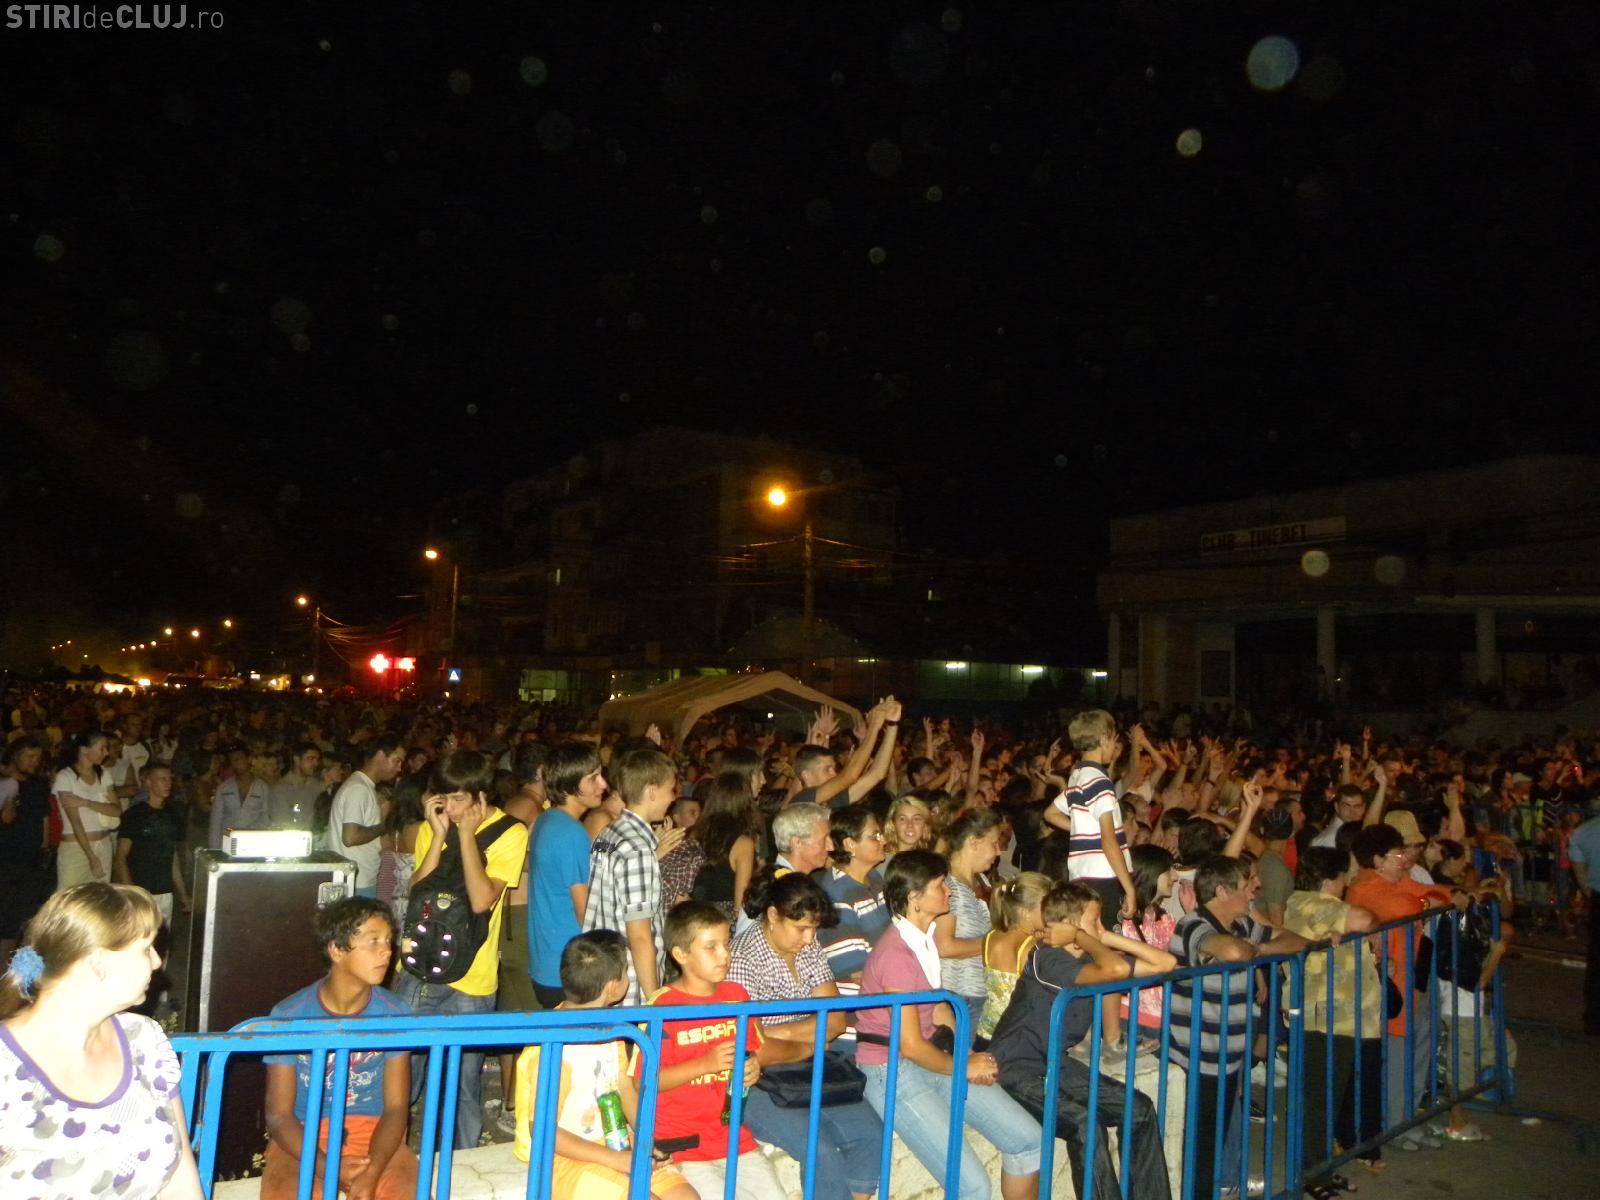 """Vita de Vie"" si ""Night Shift"" au deschis Zilele orasului Turda. Haddaway urca azi pe scena de la ora 21.00!"